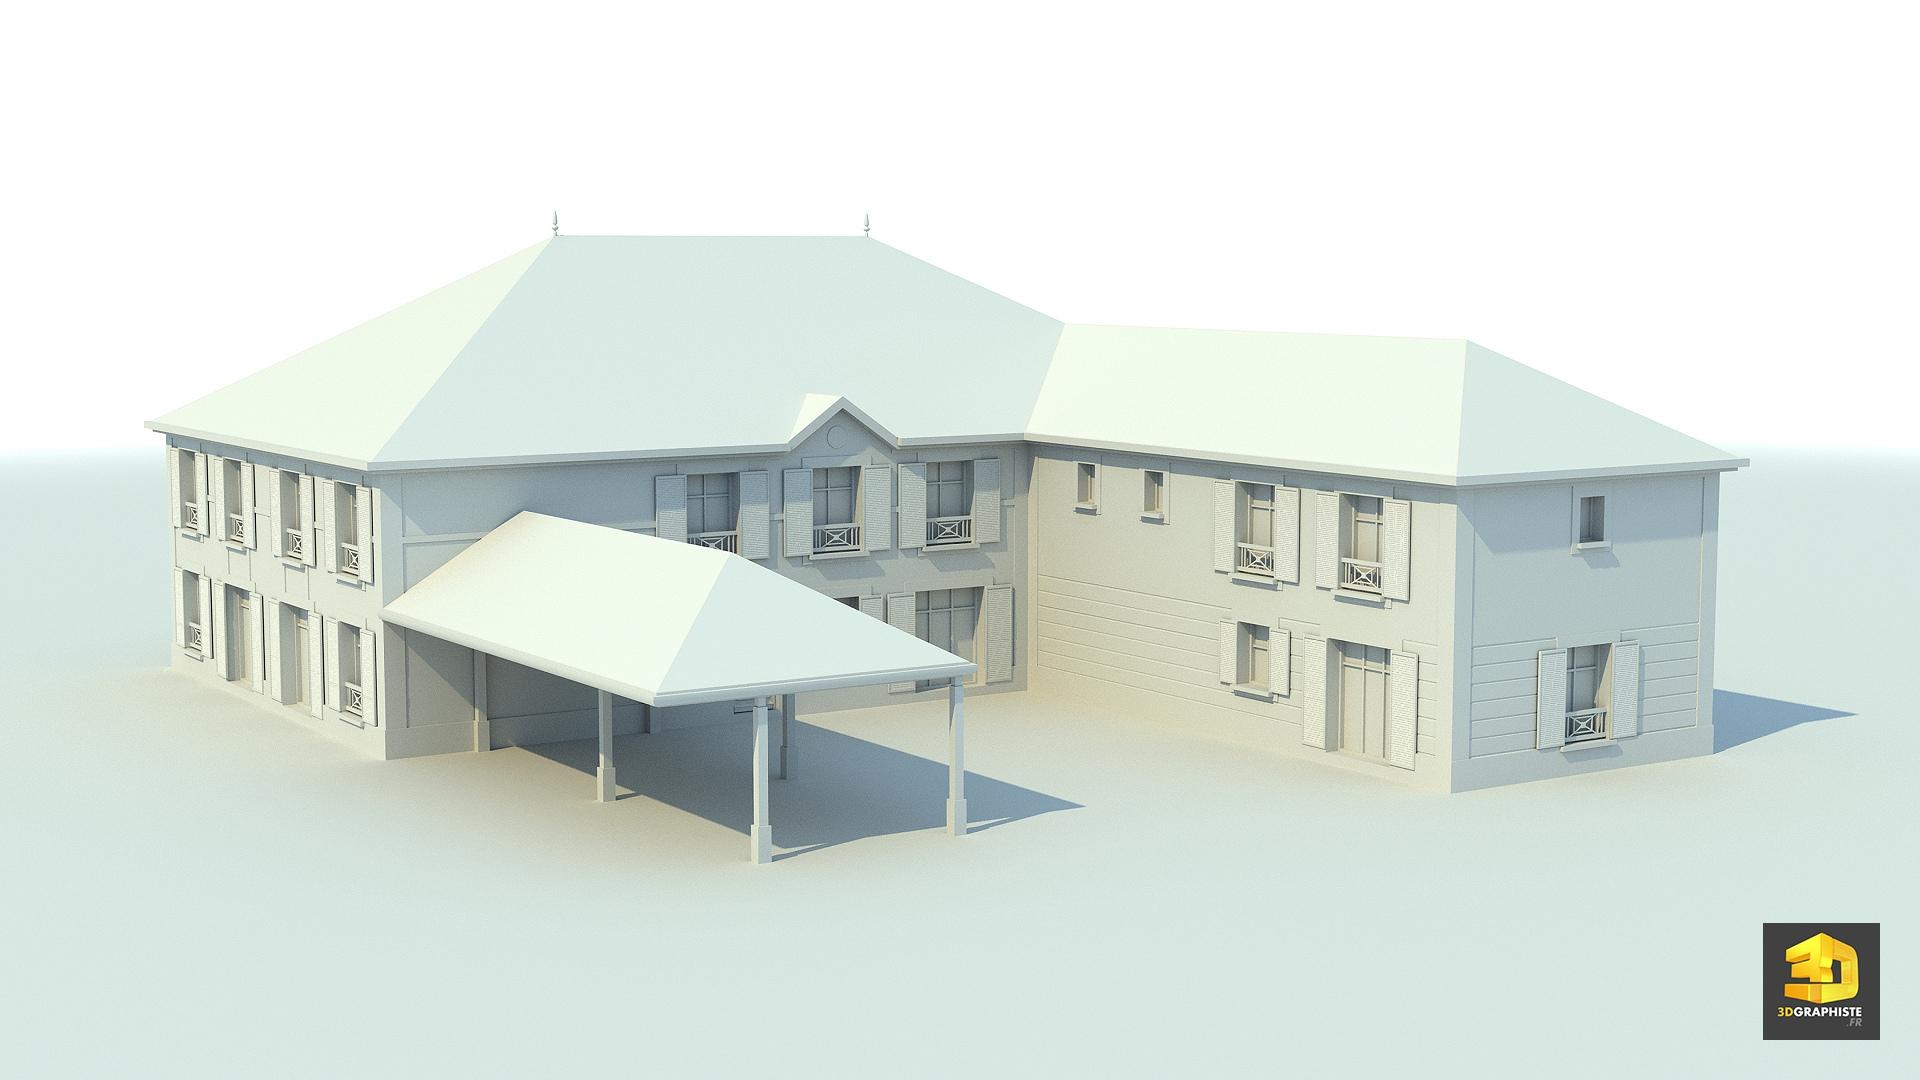 mod lisation 3d pour l 39 architecture 3dgraphiste fr. Black Bedroom Furniture Sets. Home Design Ideas